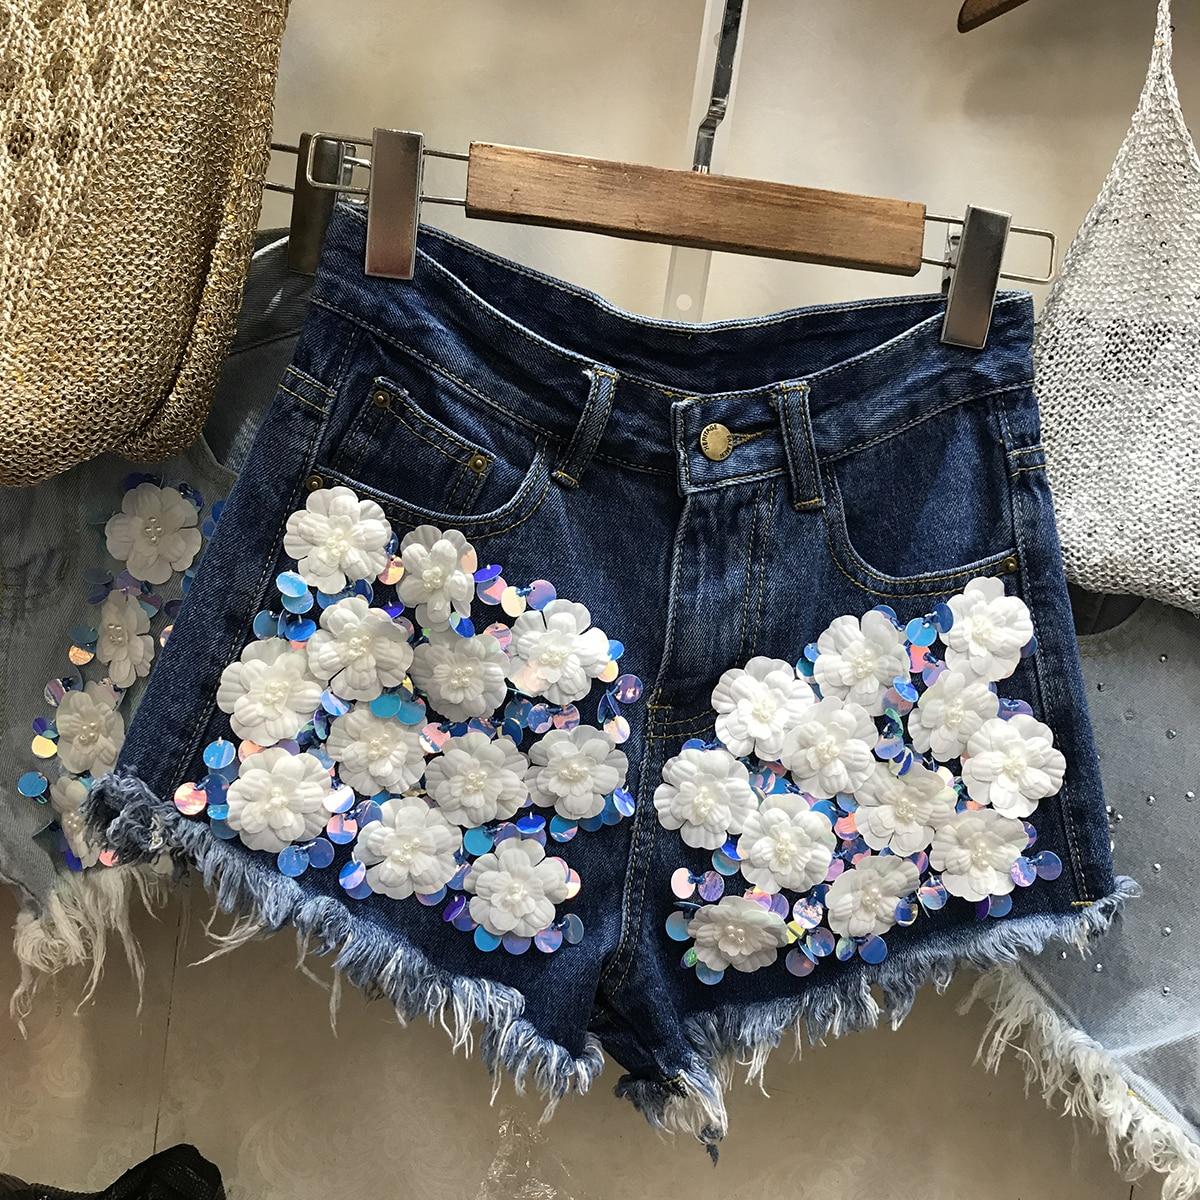 Dark Moda Corto Bordado Mujeres Rebordear Lxmsth Verano Blue light Cintura 3d Pierna Shorts Blue Ancha Lentejuelas Flores Pesado Femenino Loose Alta TWPSq